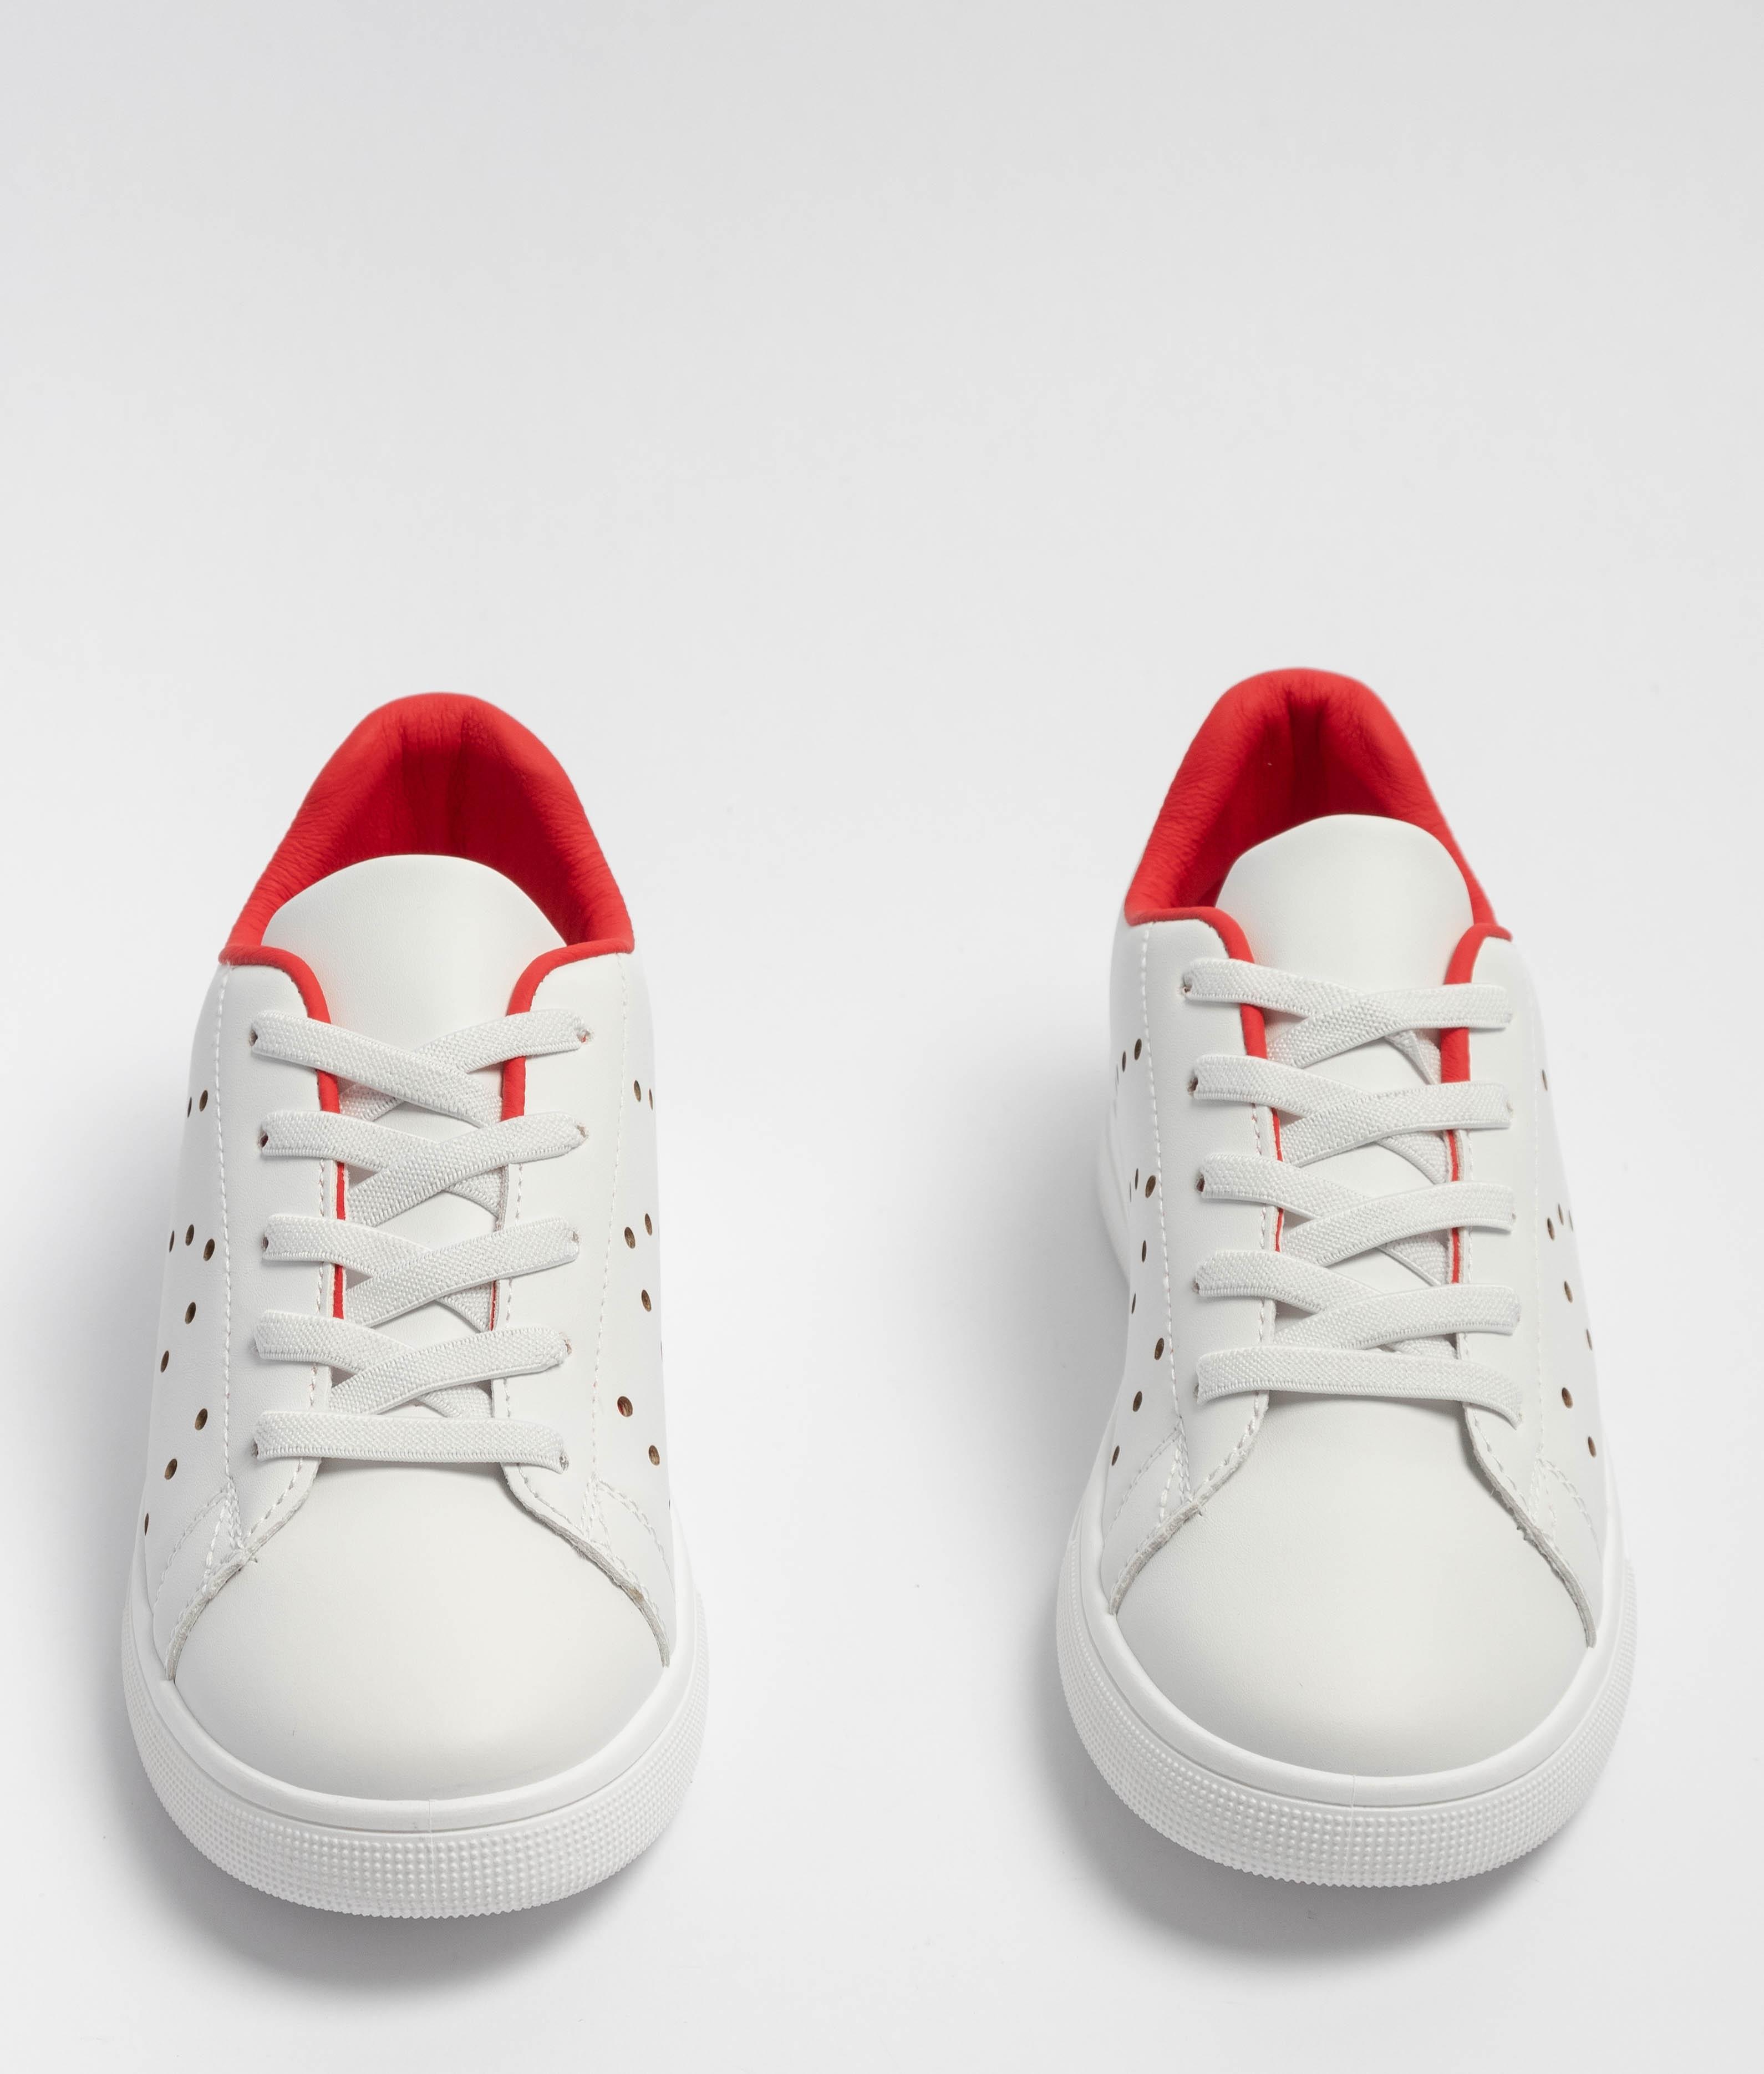 Sneakers Atelier - Vermelho